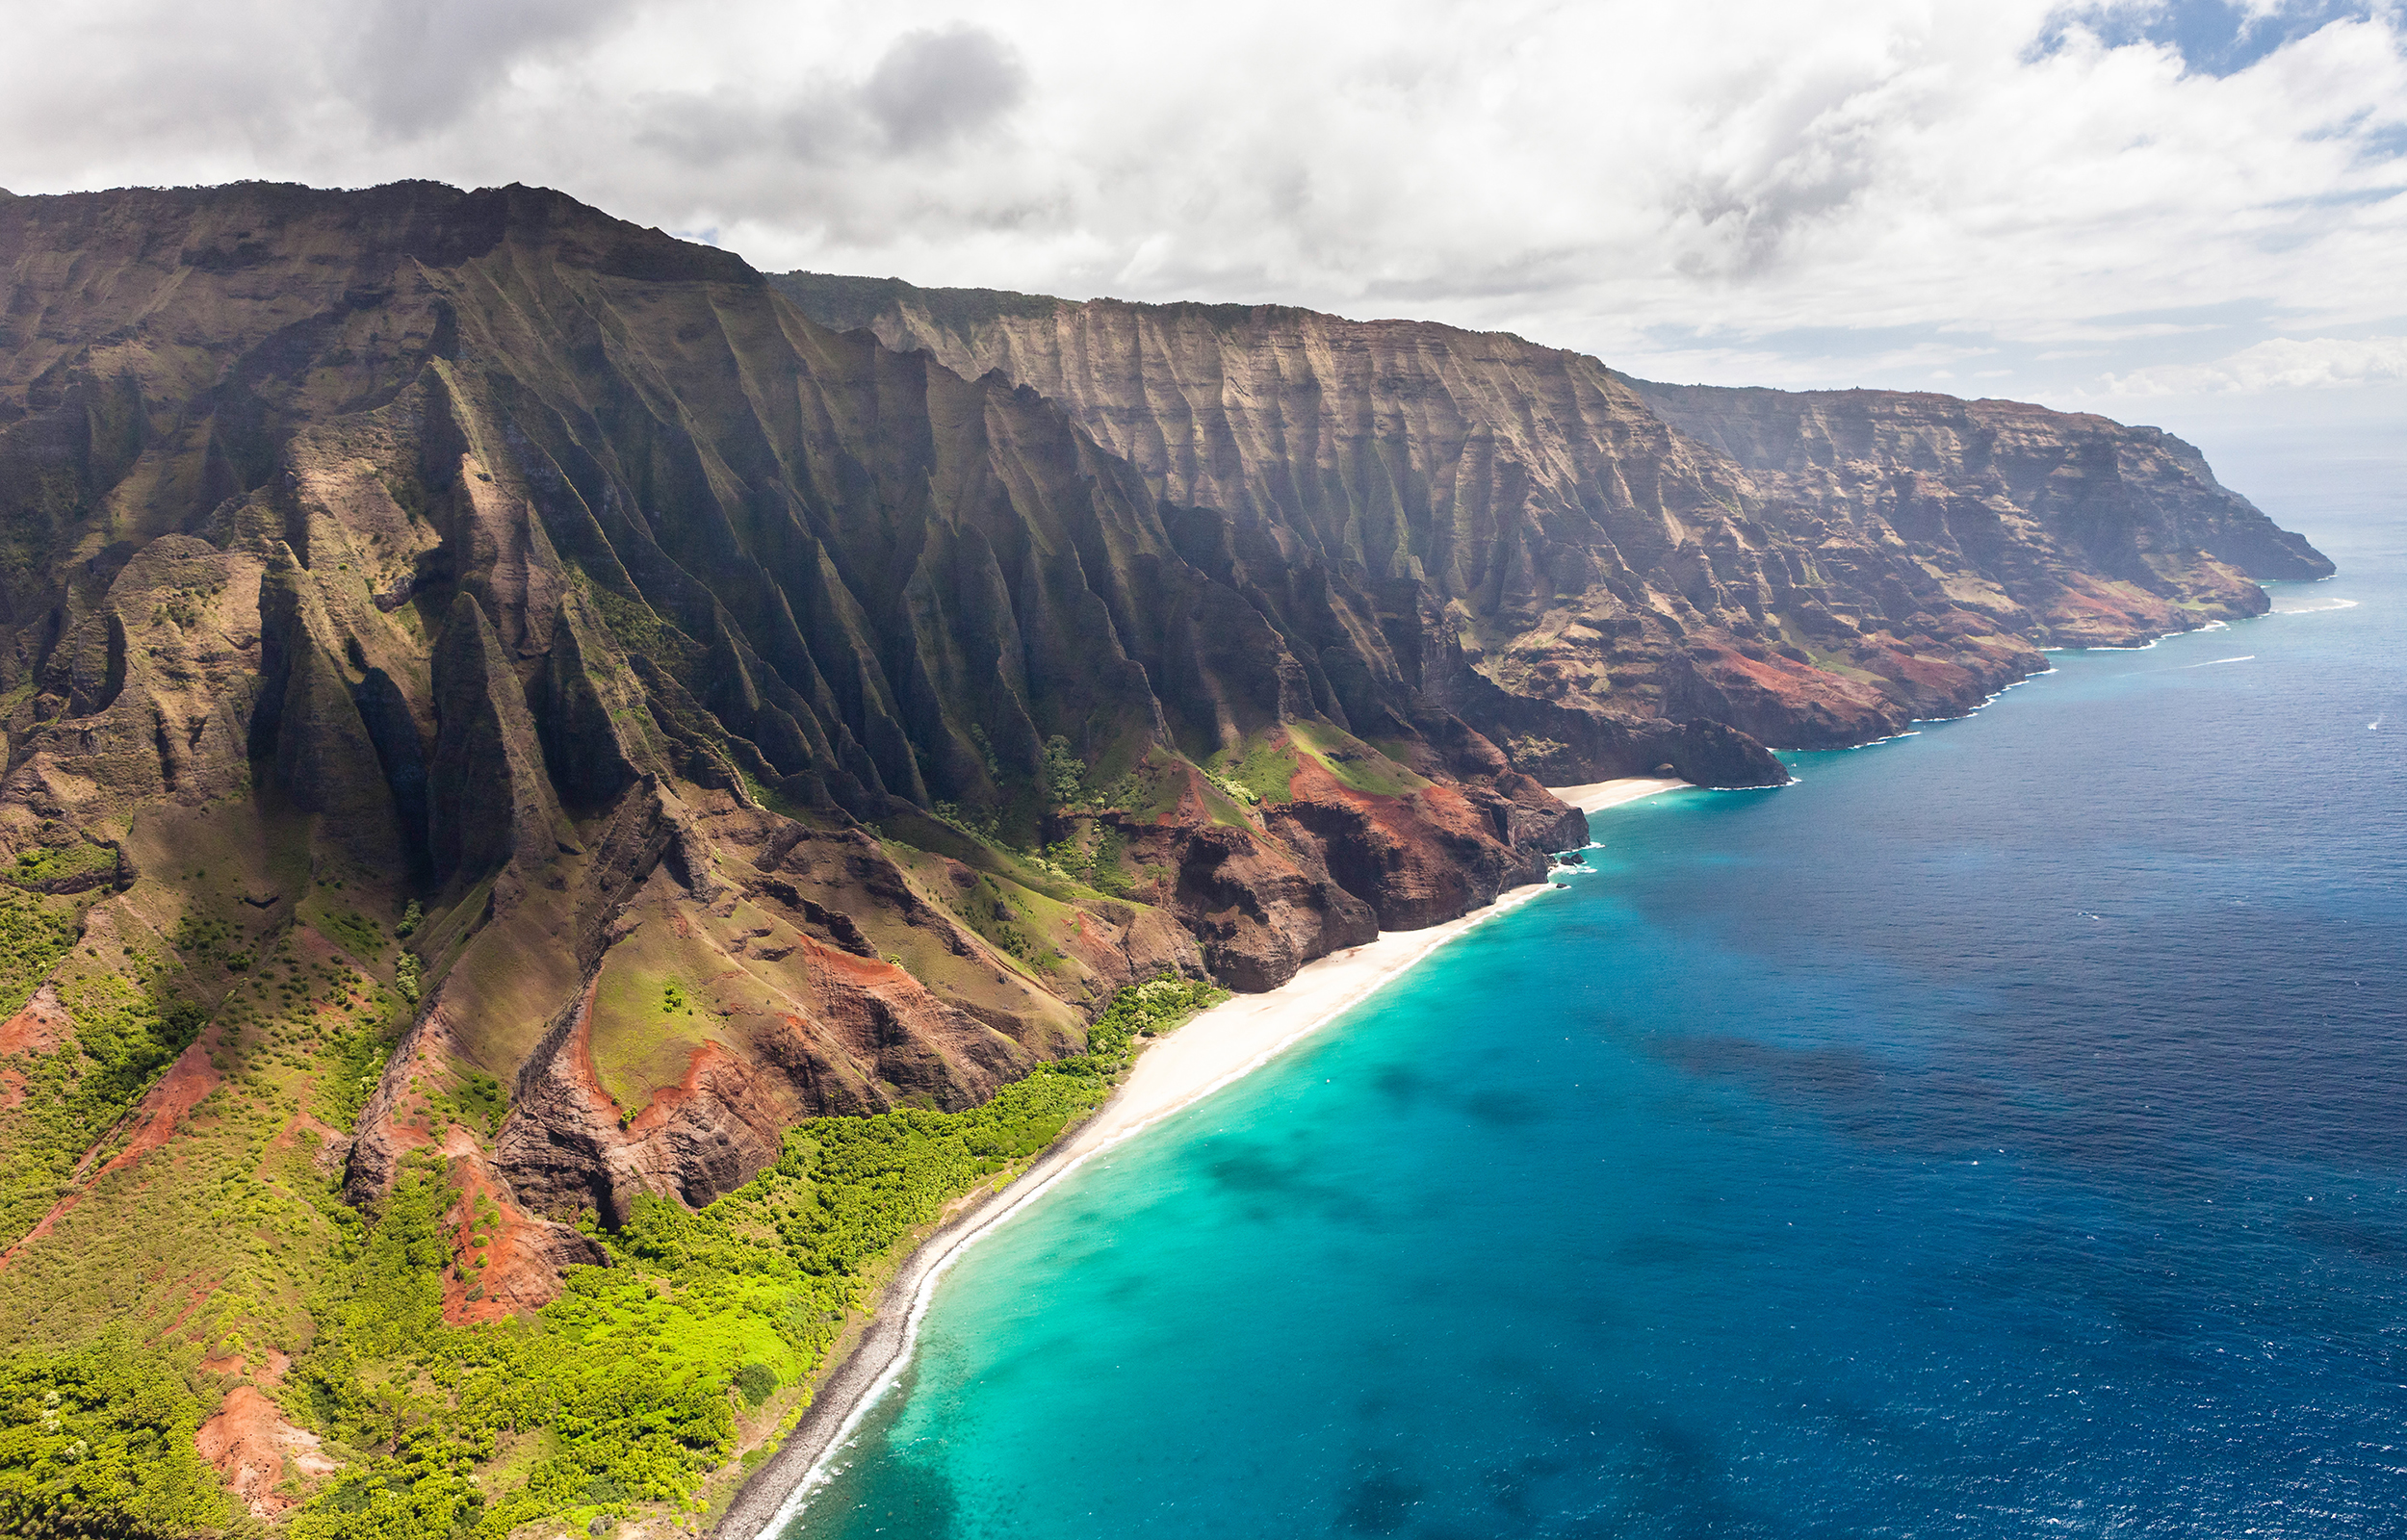 Na_Pali_Coast,_Kauai,_Hawaii.jpg